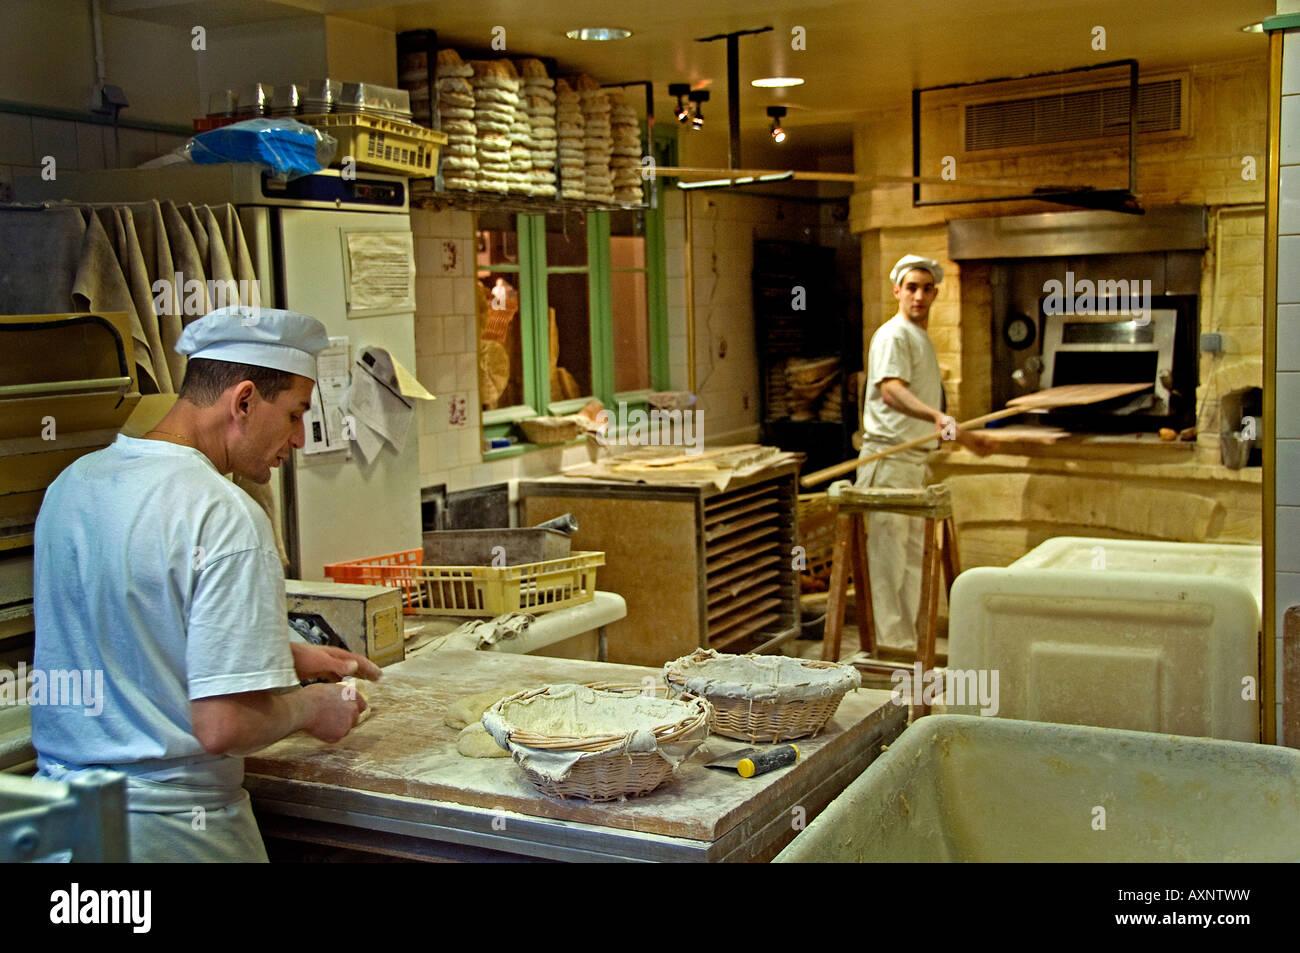 St Germain des Pres Paris Bakery bakehouse baker - Stock Image